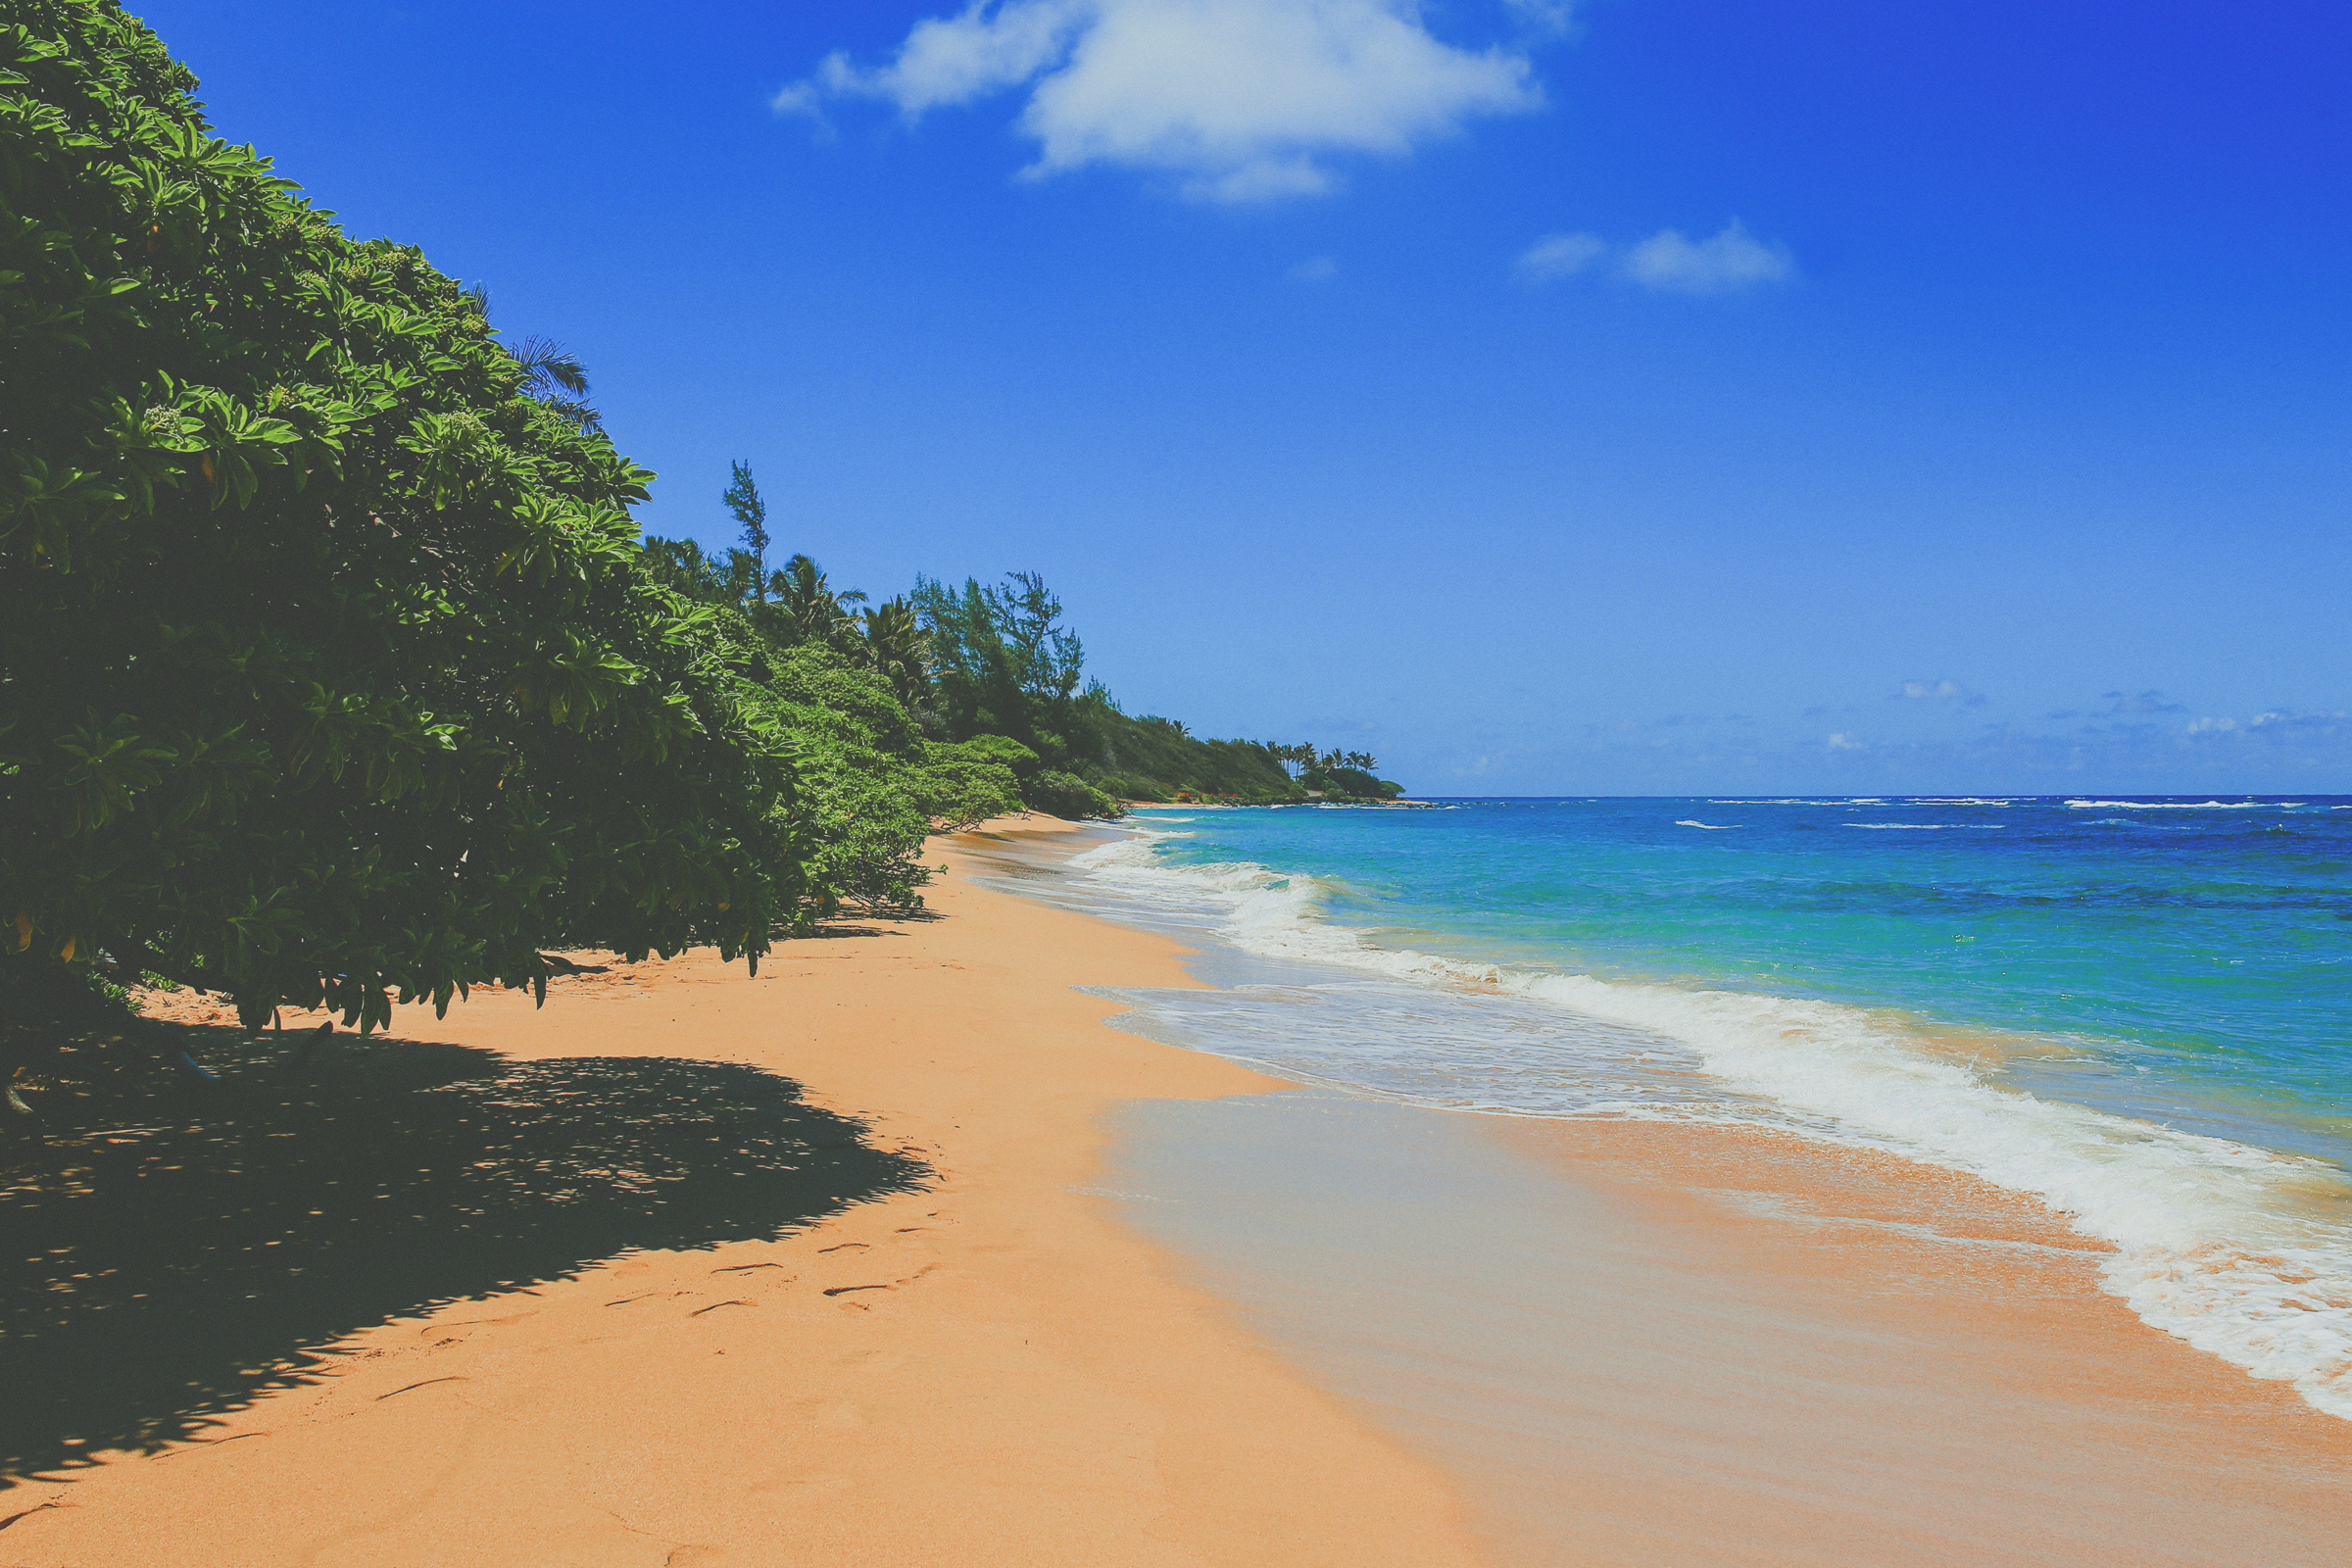 IMG_2982--KAUAI-HAWAII-JENNIFER-PICARD-PHOTOGRAPHY.jpg